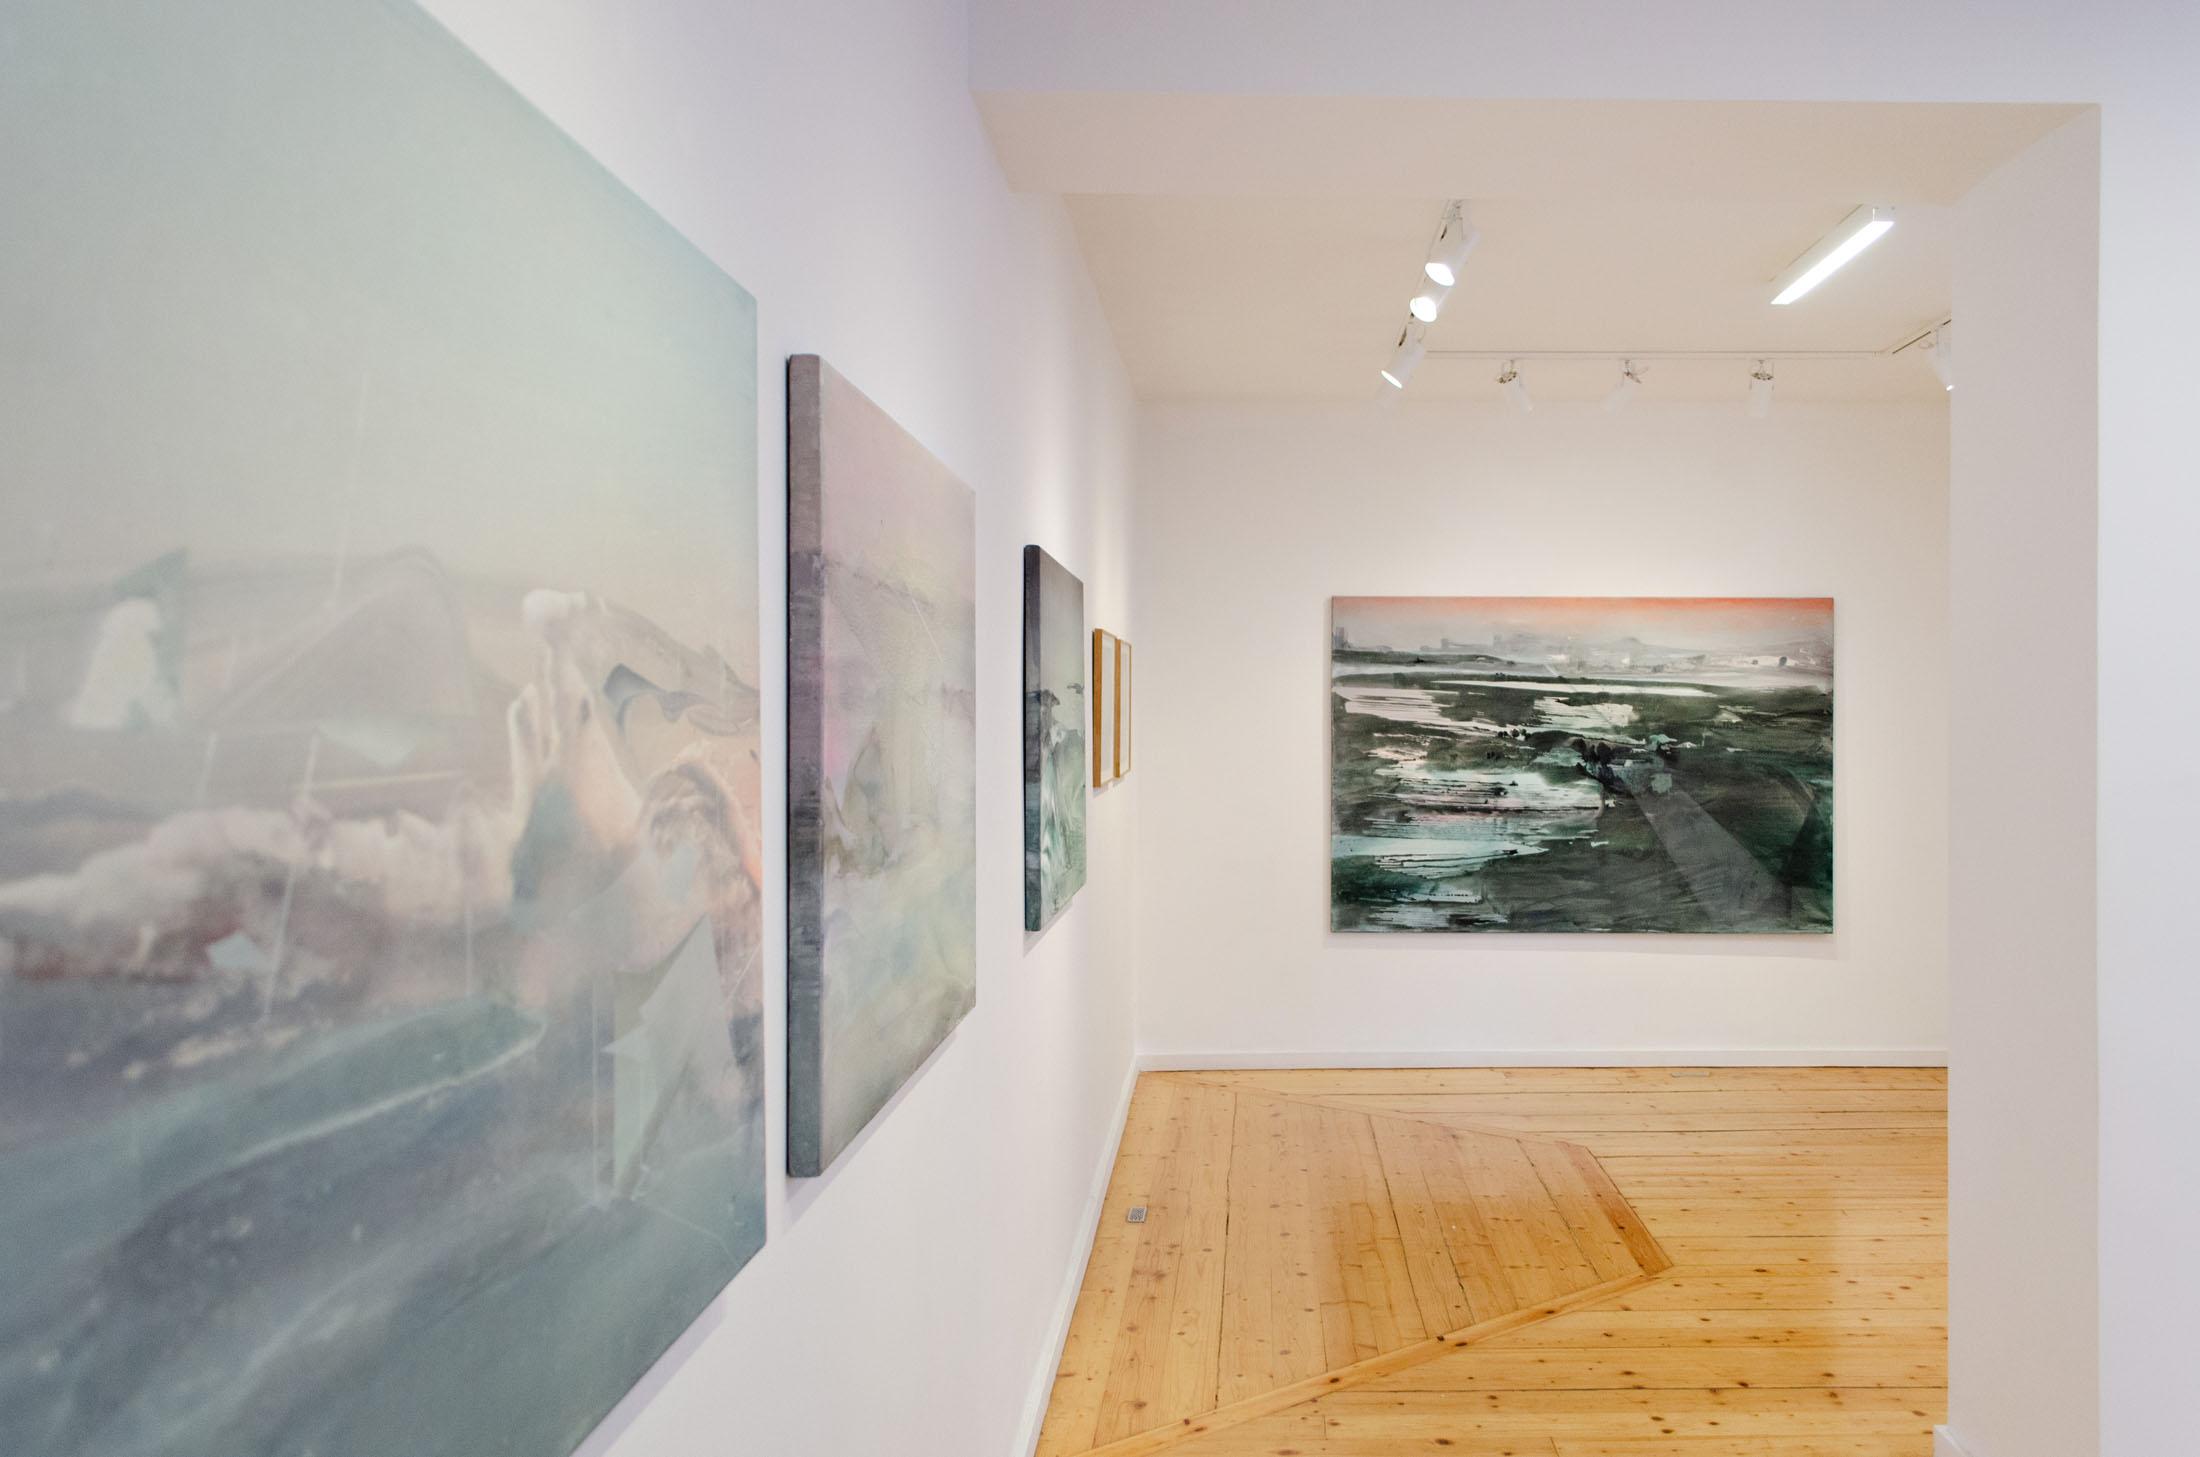 Alexandra Roussopoulos, Behind the Horizon, Nitra Gallery Athens